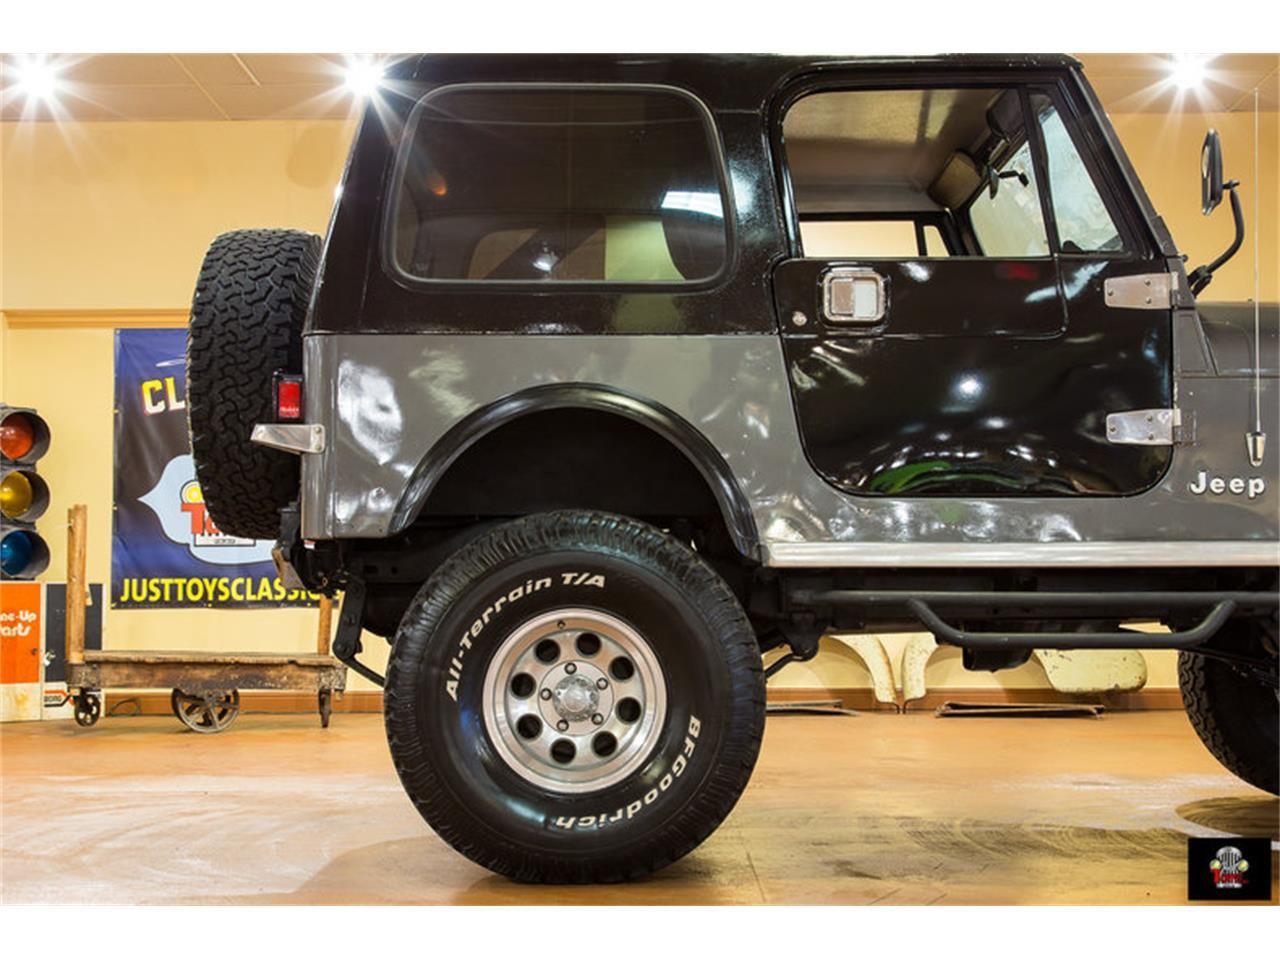 Large Picture of 1986 Jeep CJ7 located in Orlando Florida - $22,995.00 - L1NQ